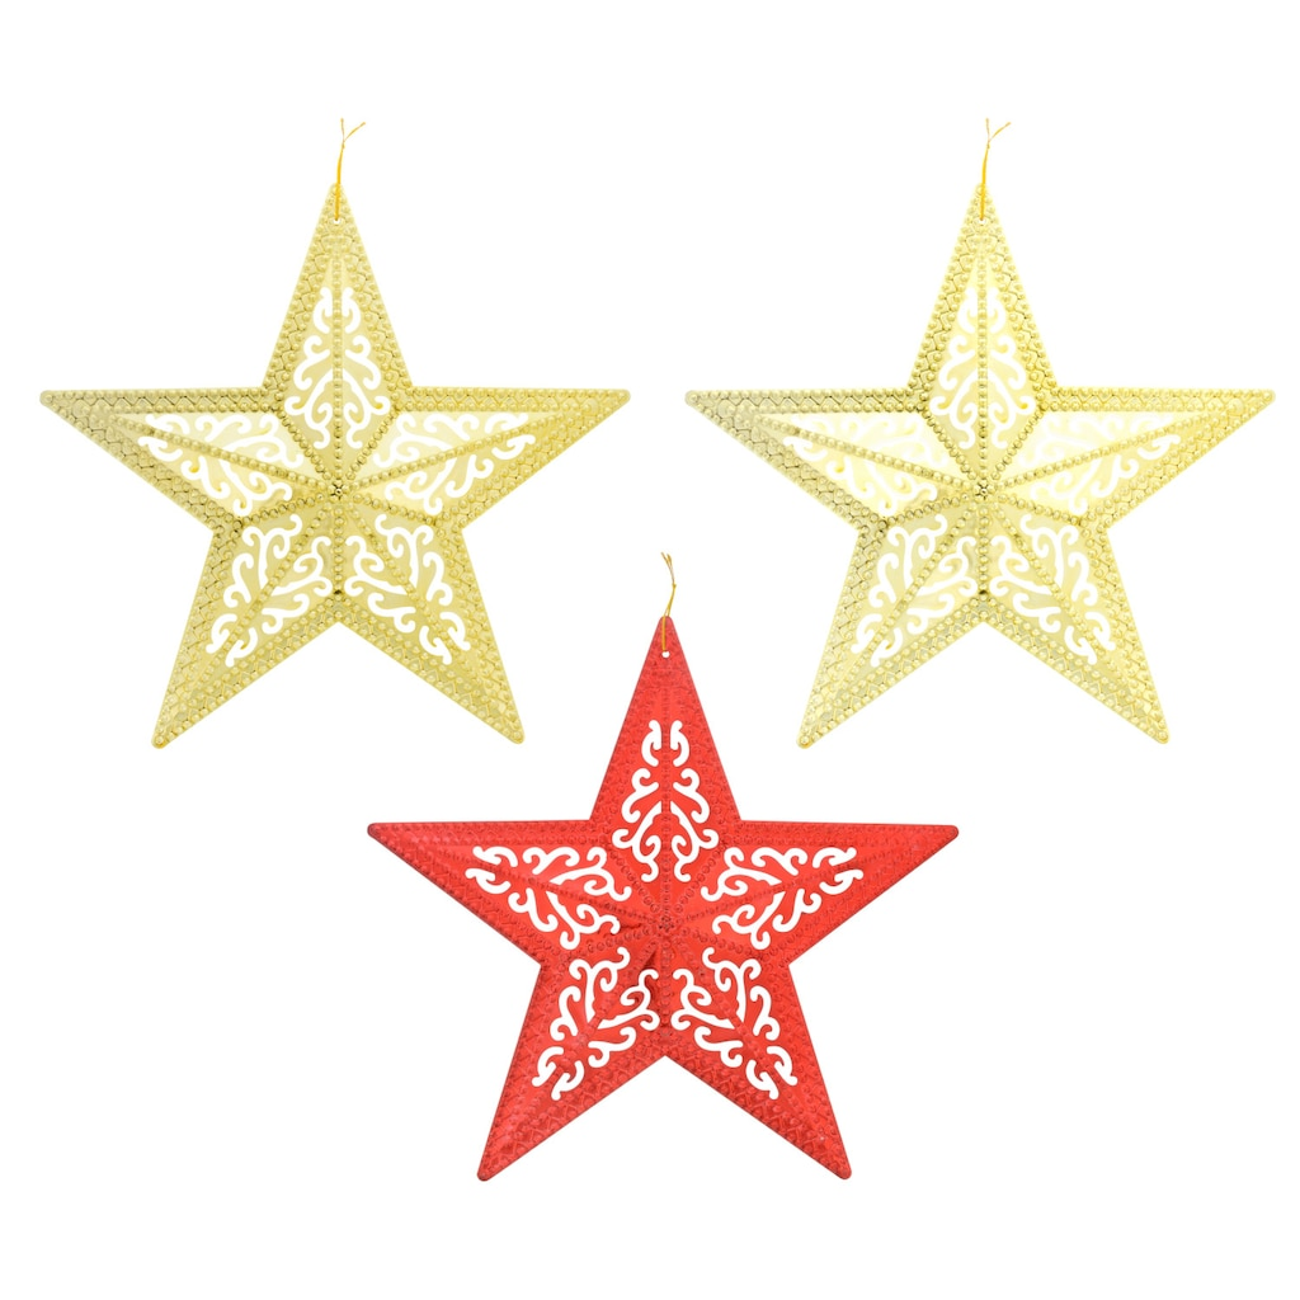 christmas house glittery hanging wall decor stars